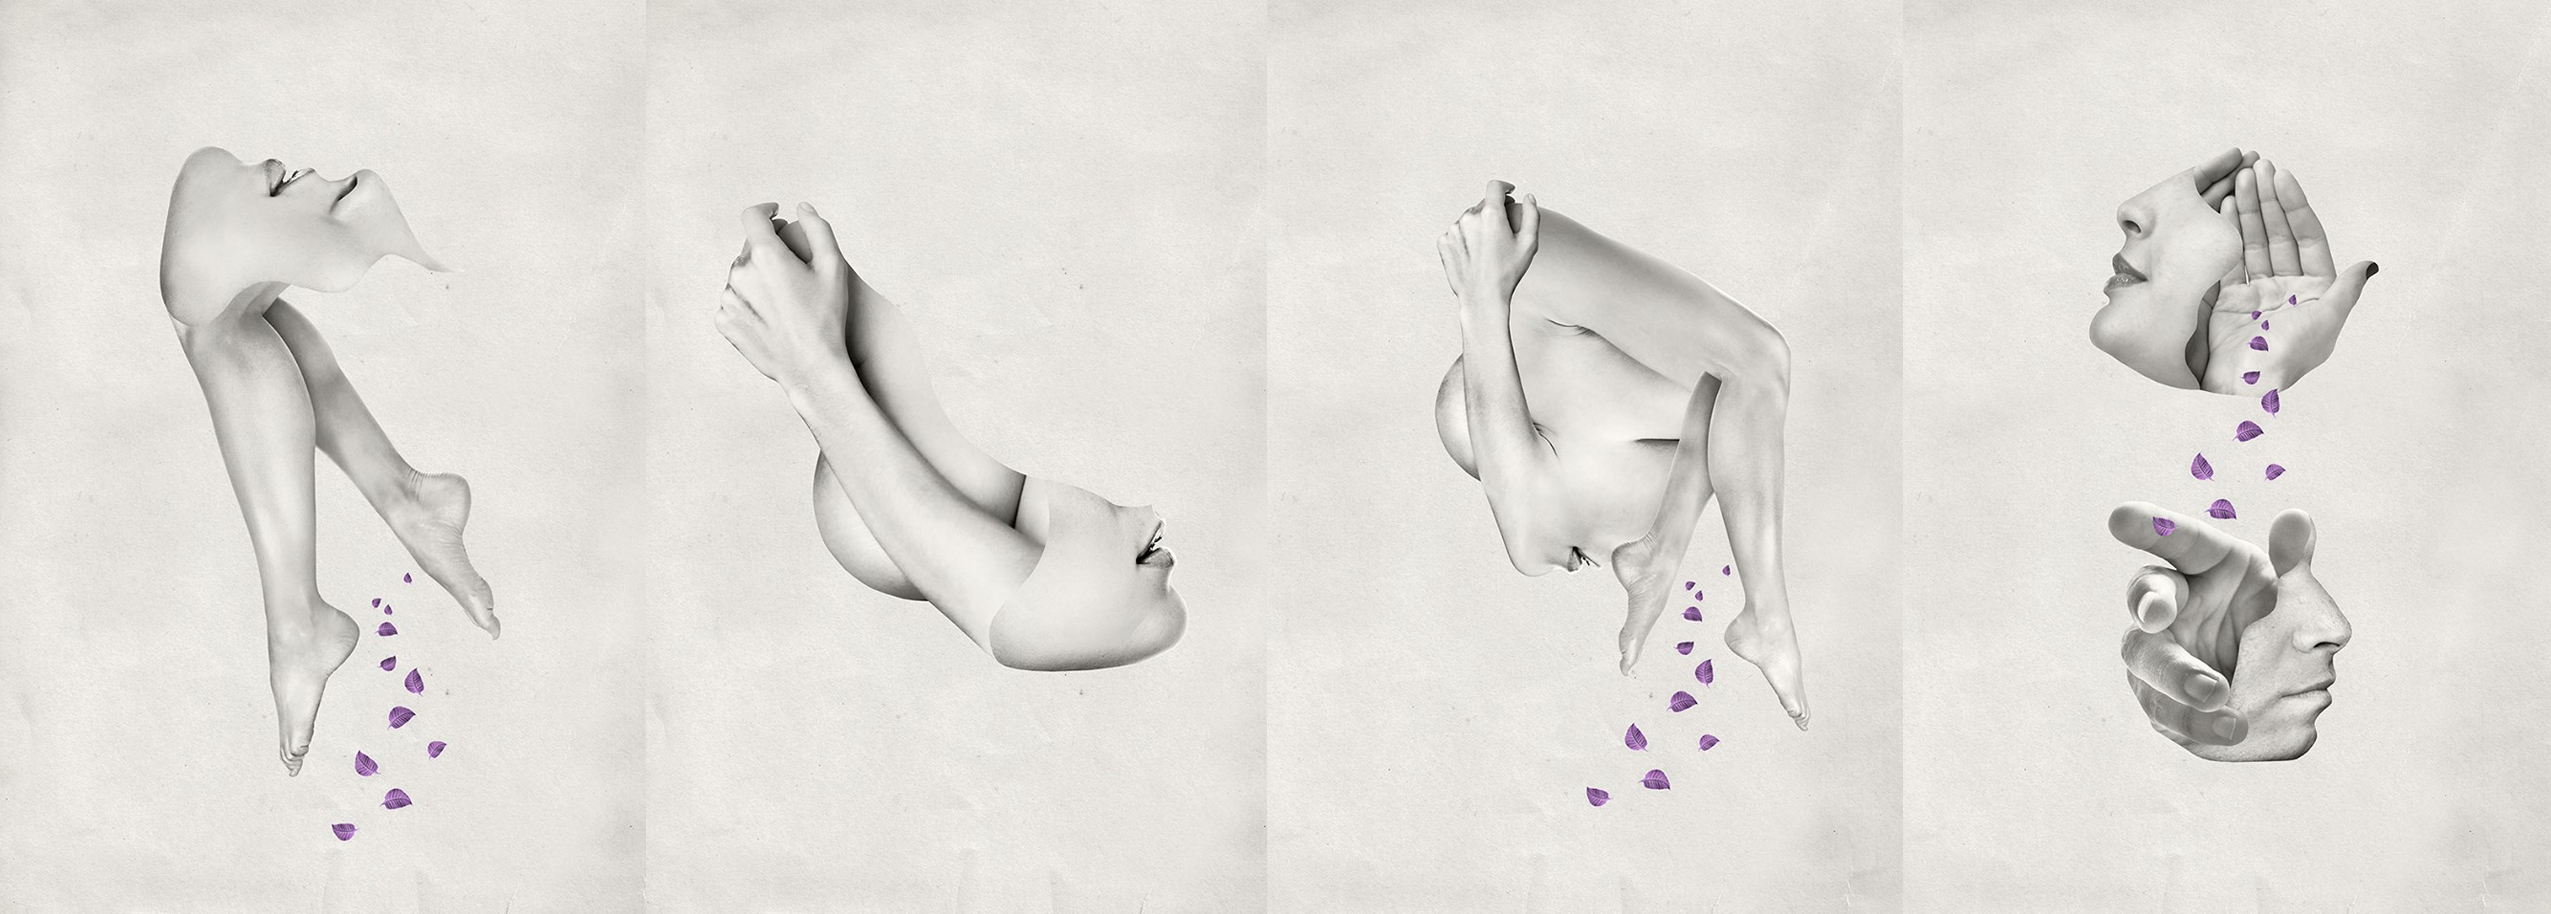 Javier Aldabalde Cavallero (@javieraldabalde) Cover Image